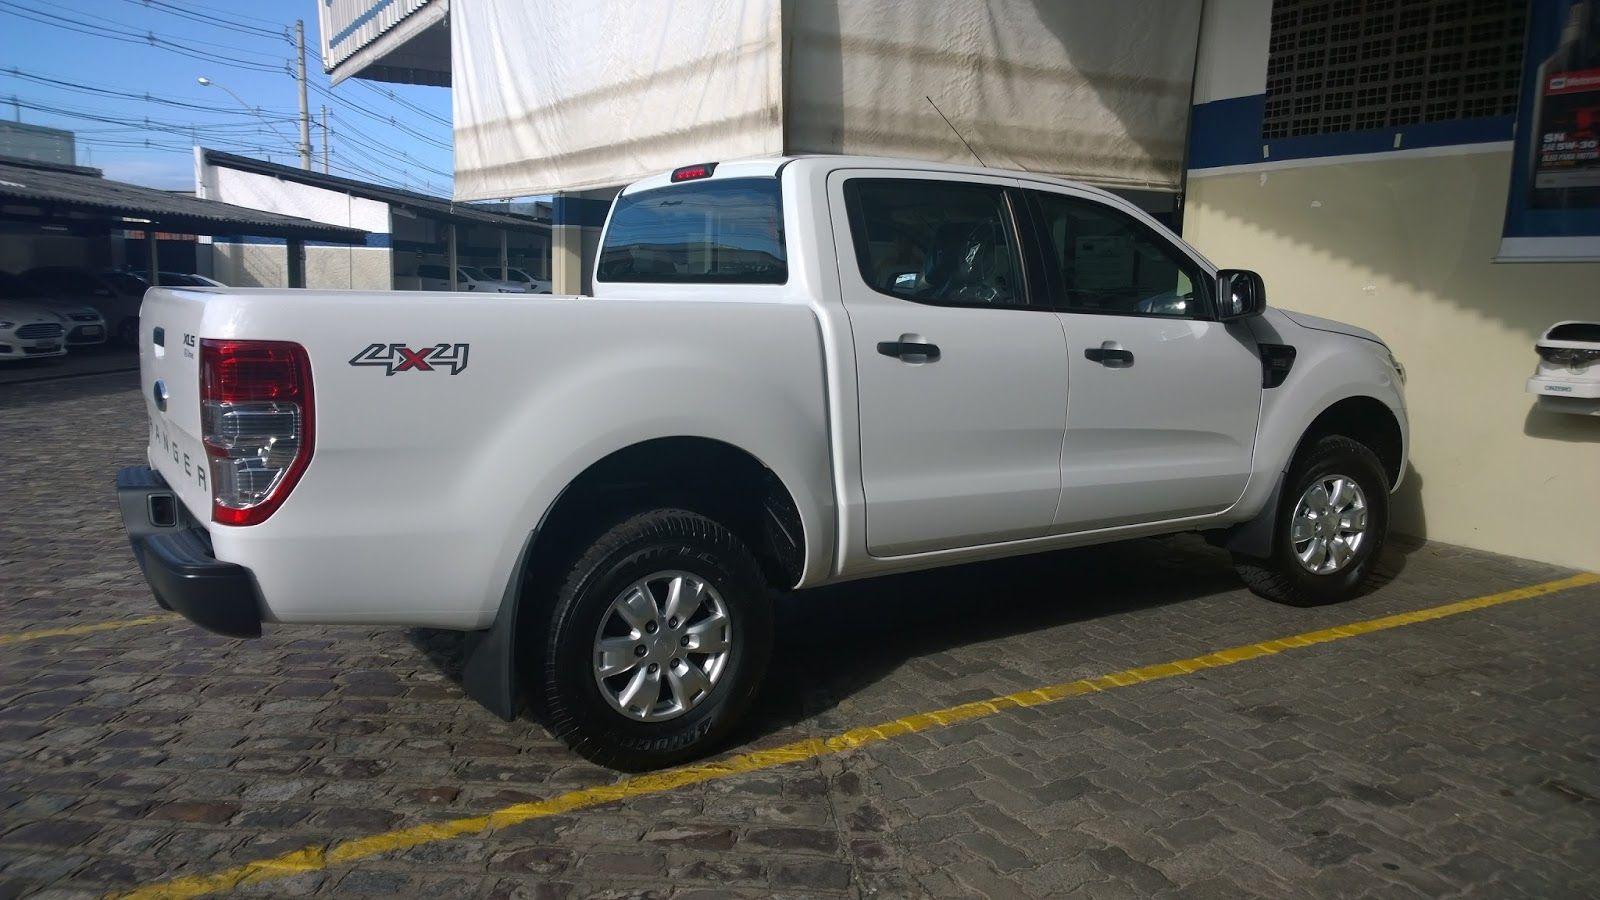 Ford Ranger Xls 2 2 Diesel 4x4